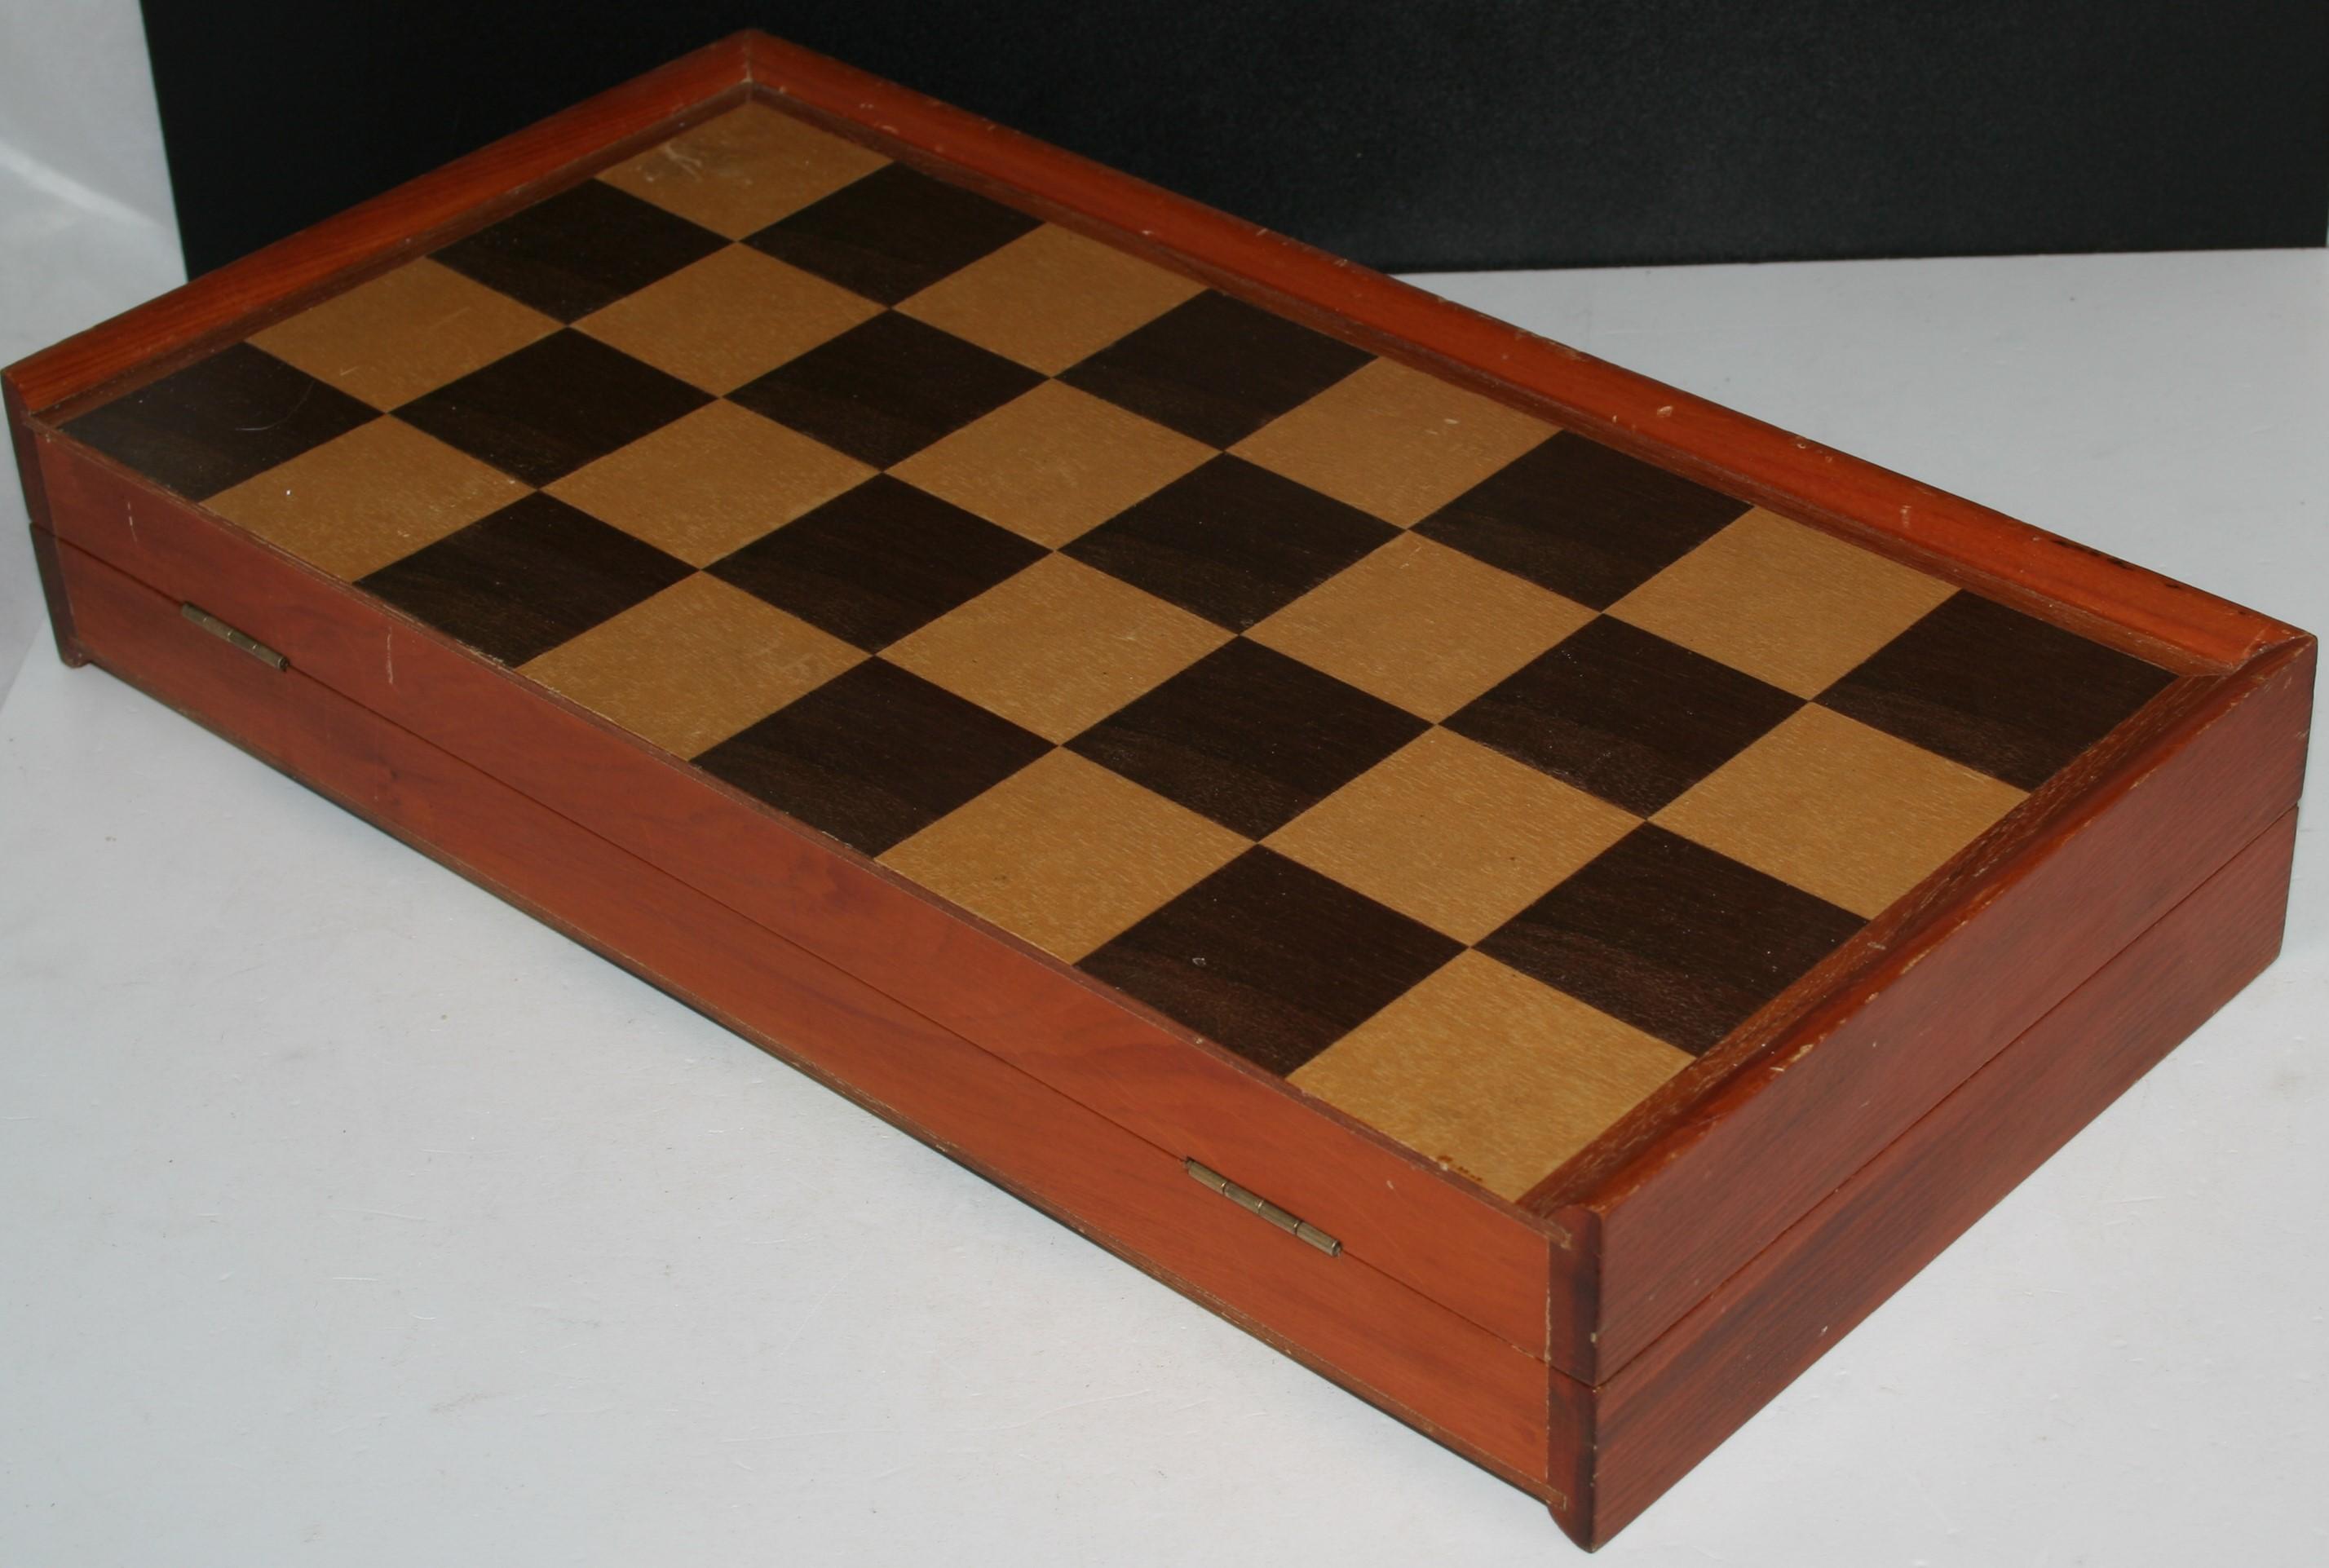 holz schachfiguren schachbrett schachspiel 40 x 40 cm schach ebay. Black Bedroom Furniture Sets. Home Design Ideas